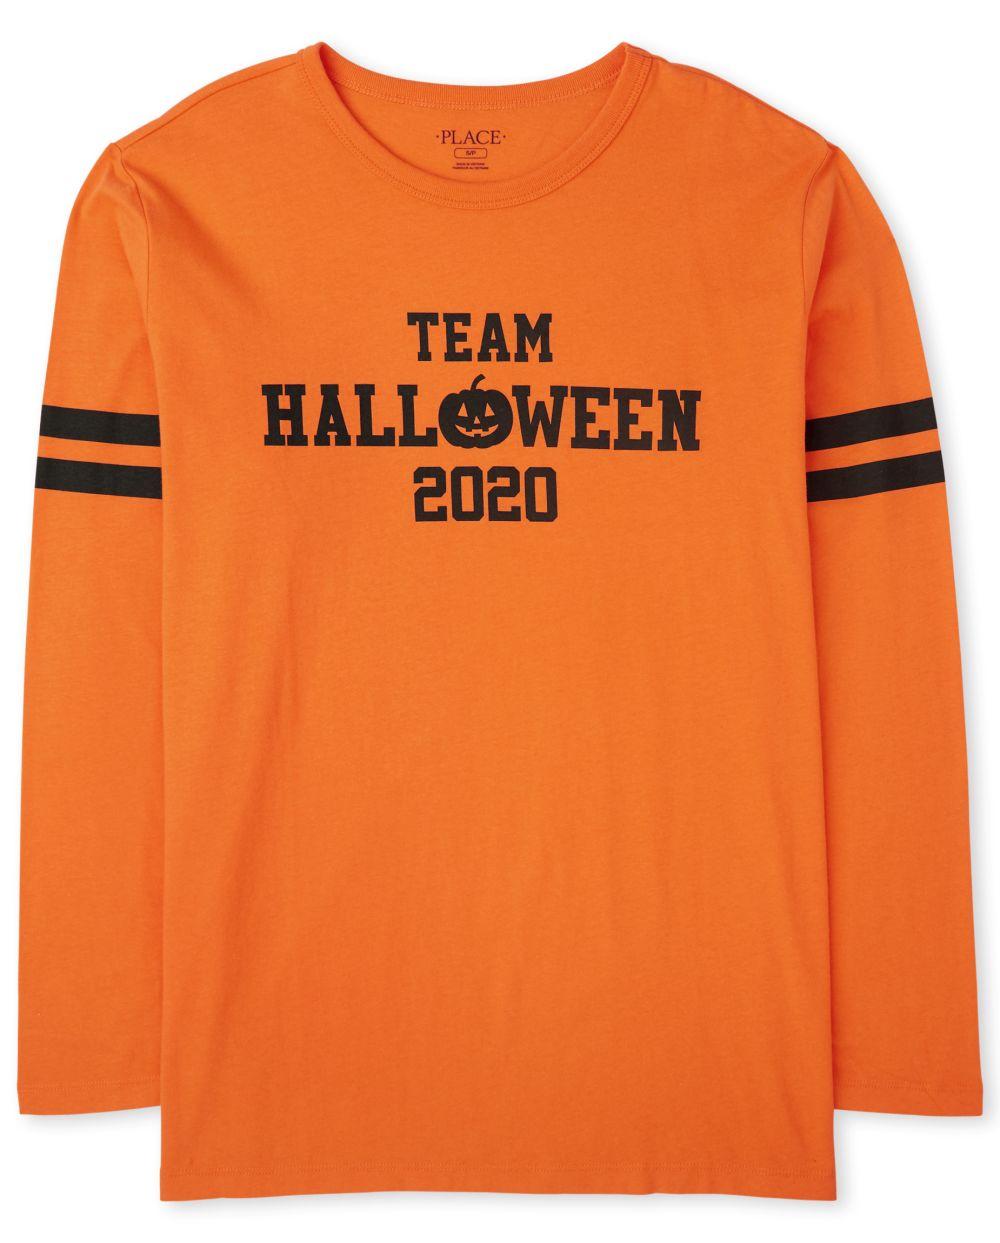 Camiseta estampada unisex para adultos de Halloween 2020 a juego para adultos